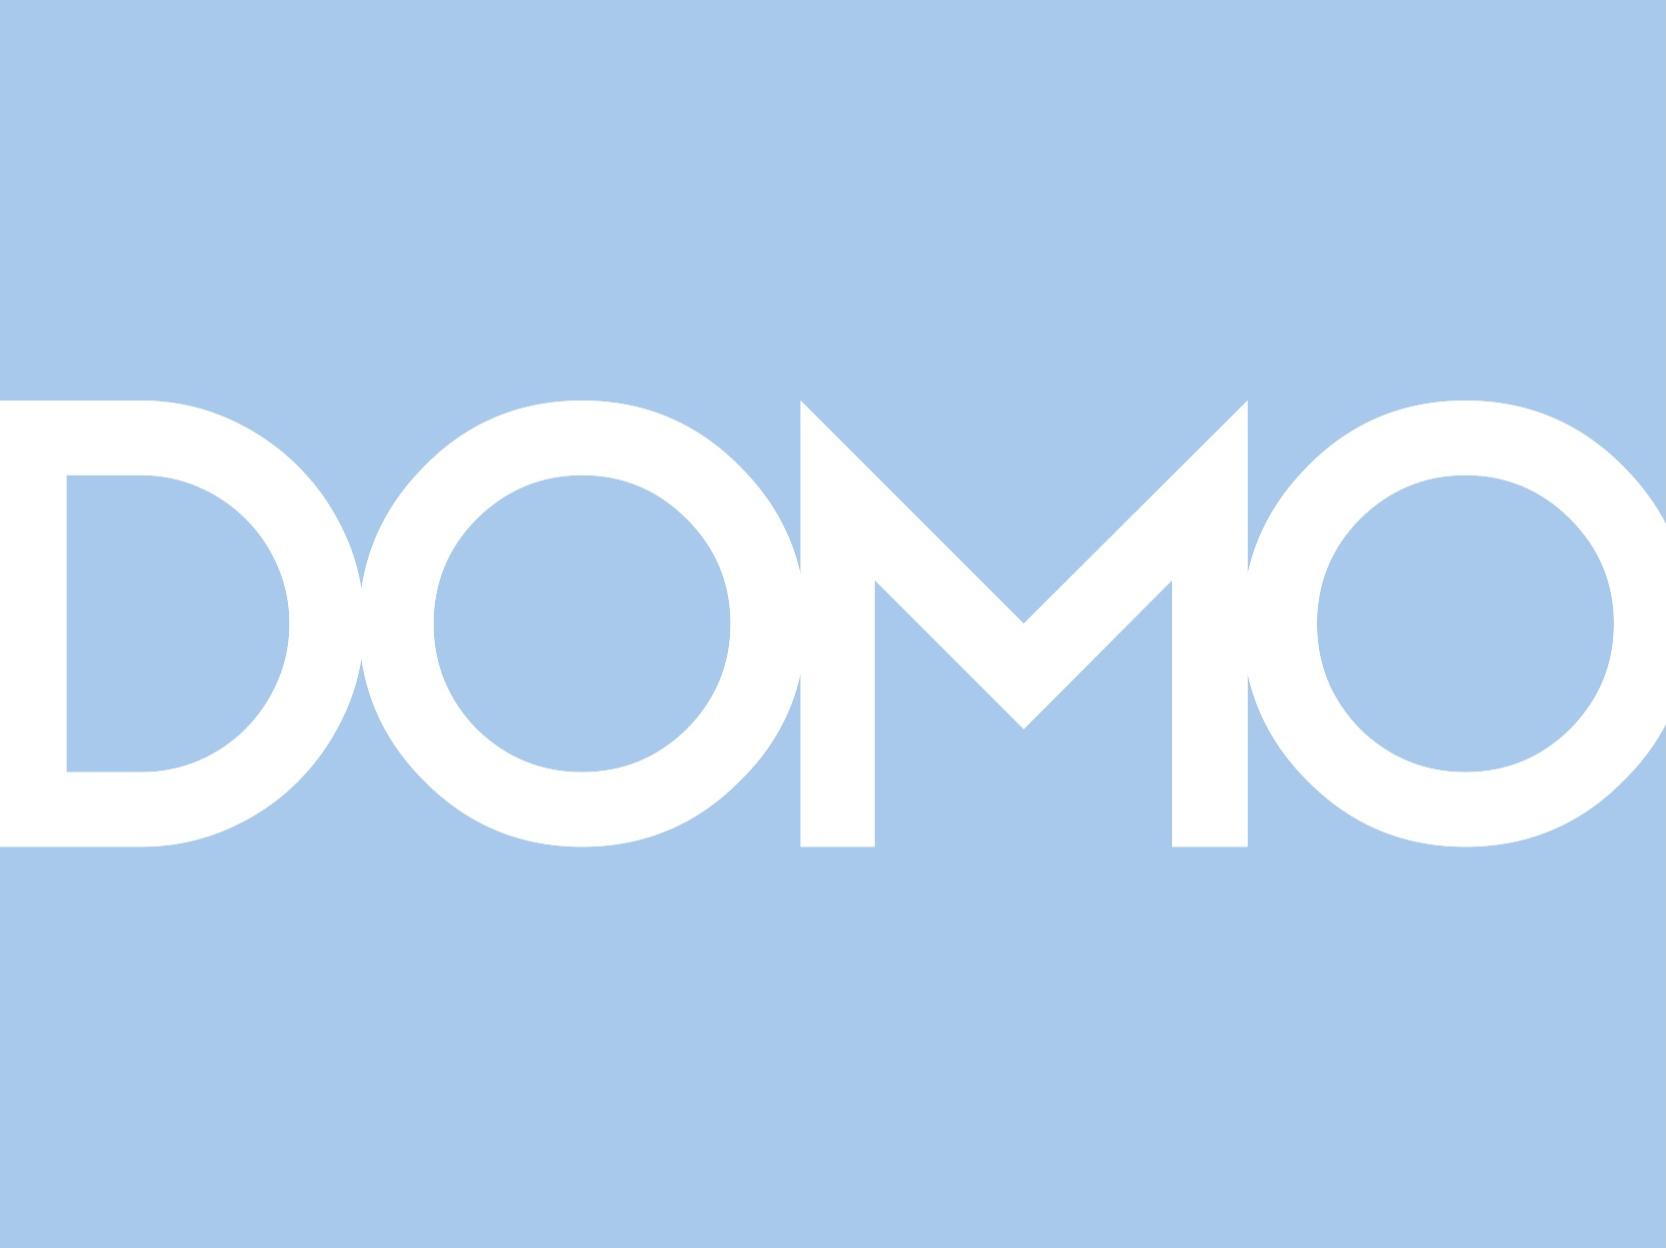 Domo analytics analitika vizualization vizualizálás cloud felhő